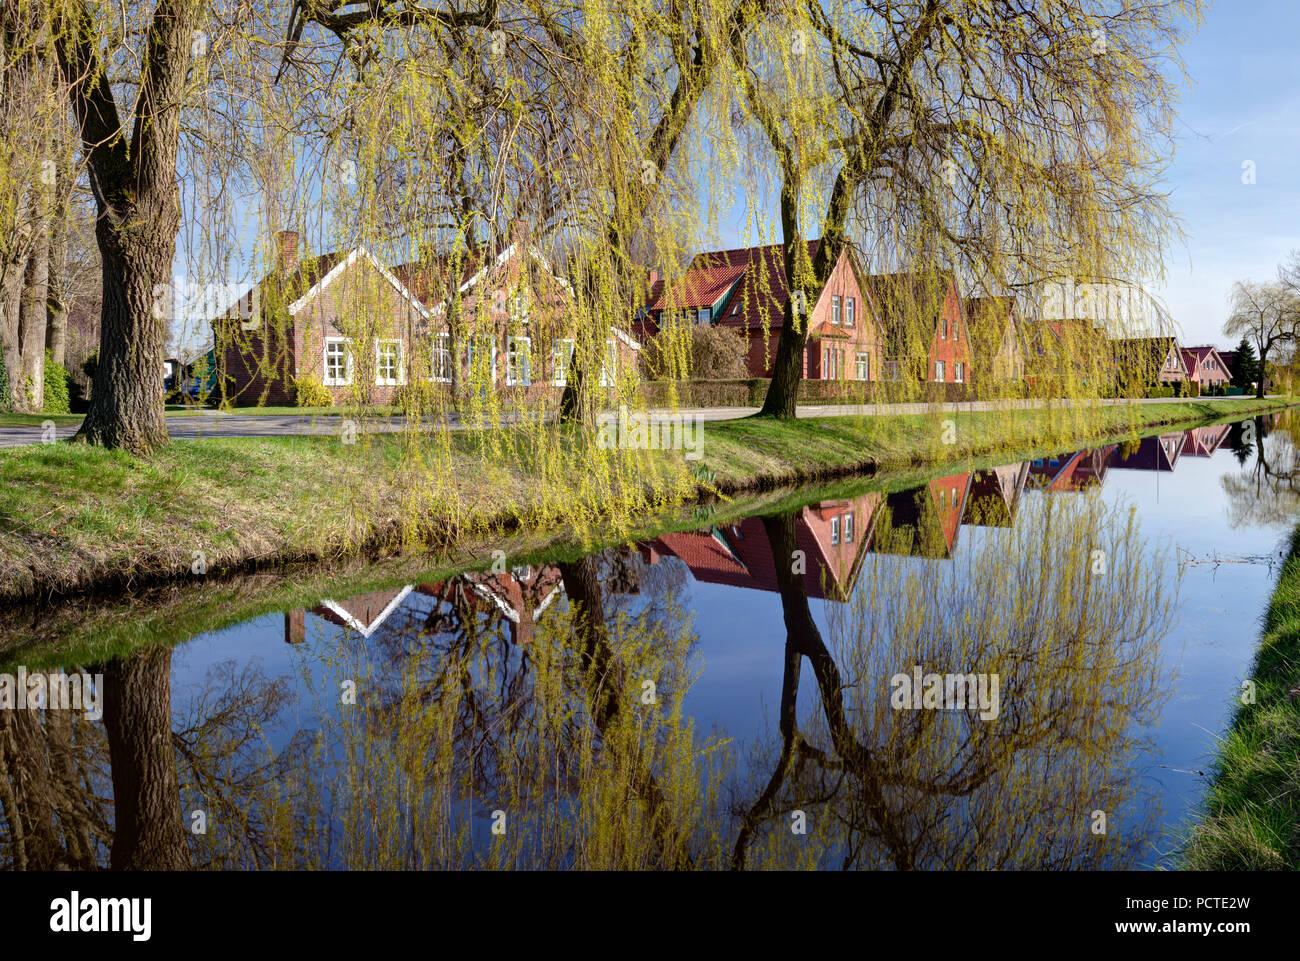 Idyll at the Wiek, Spring, Papenburg, Emsland, Lower Saxony, Germany, - Stock Image